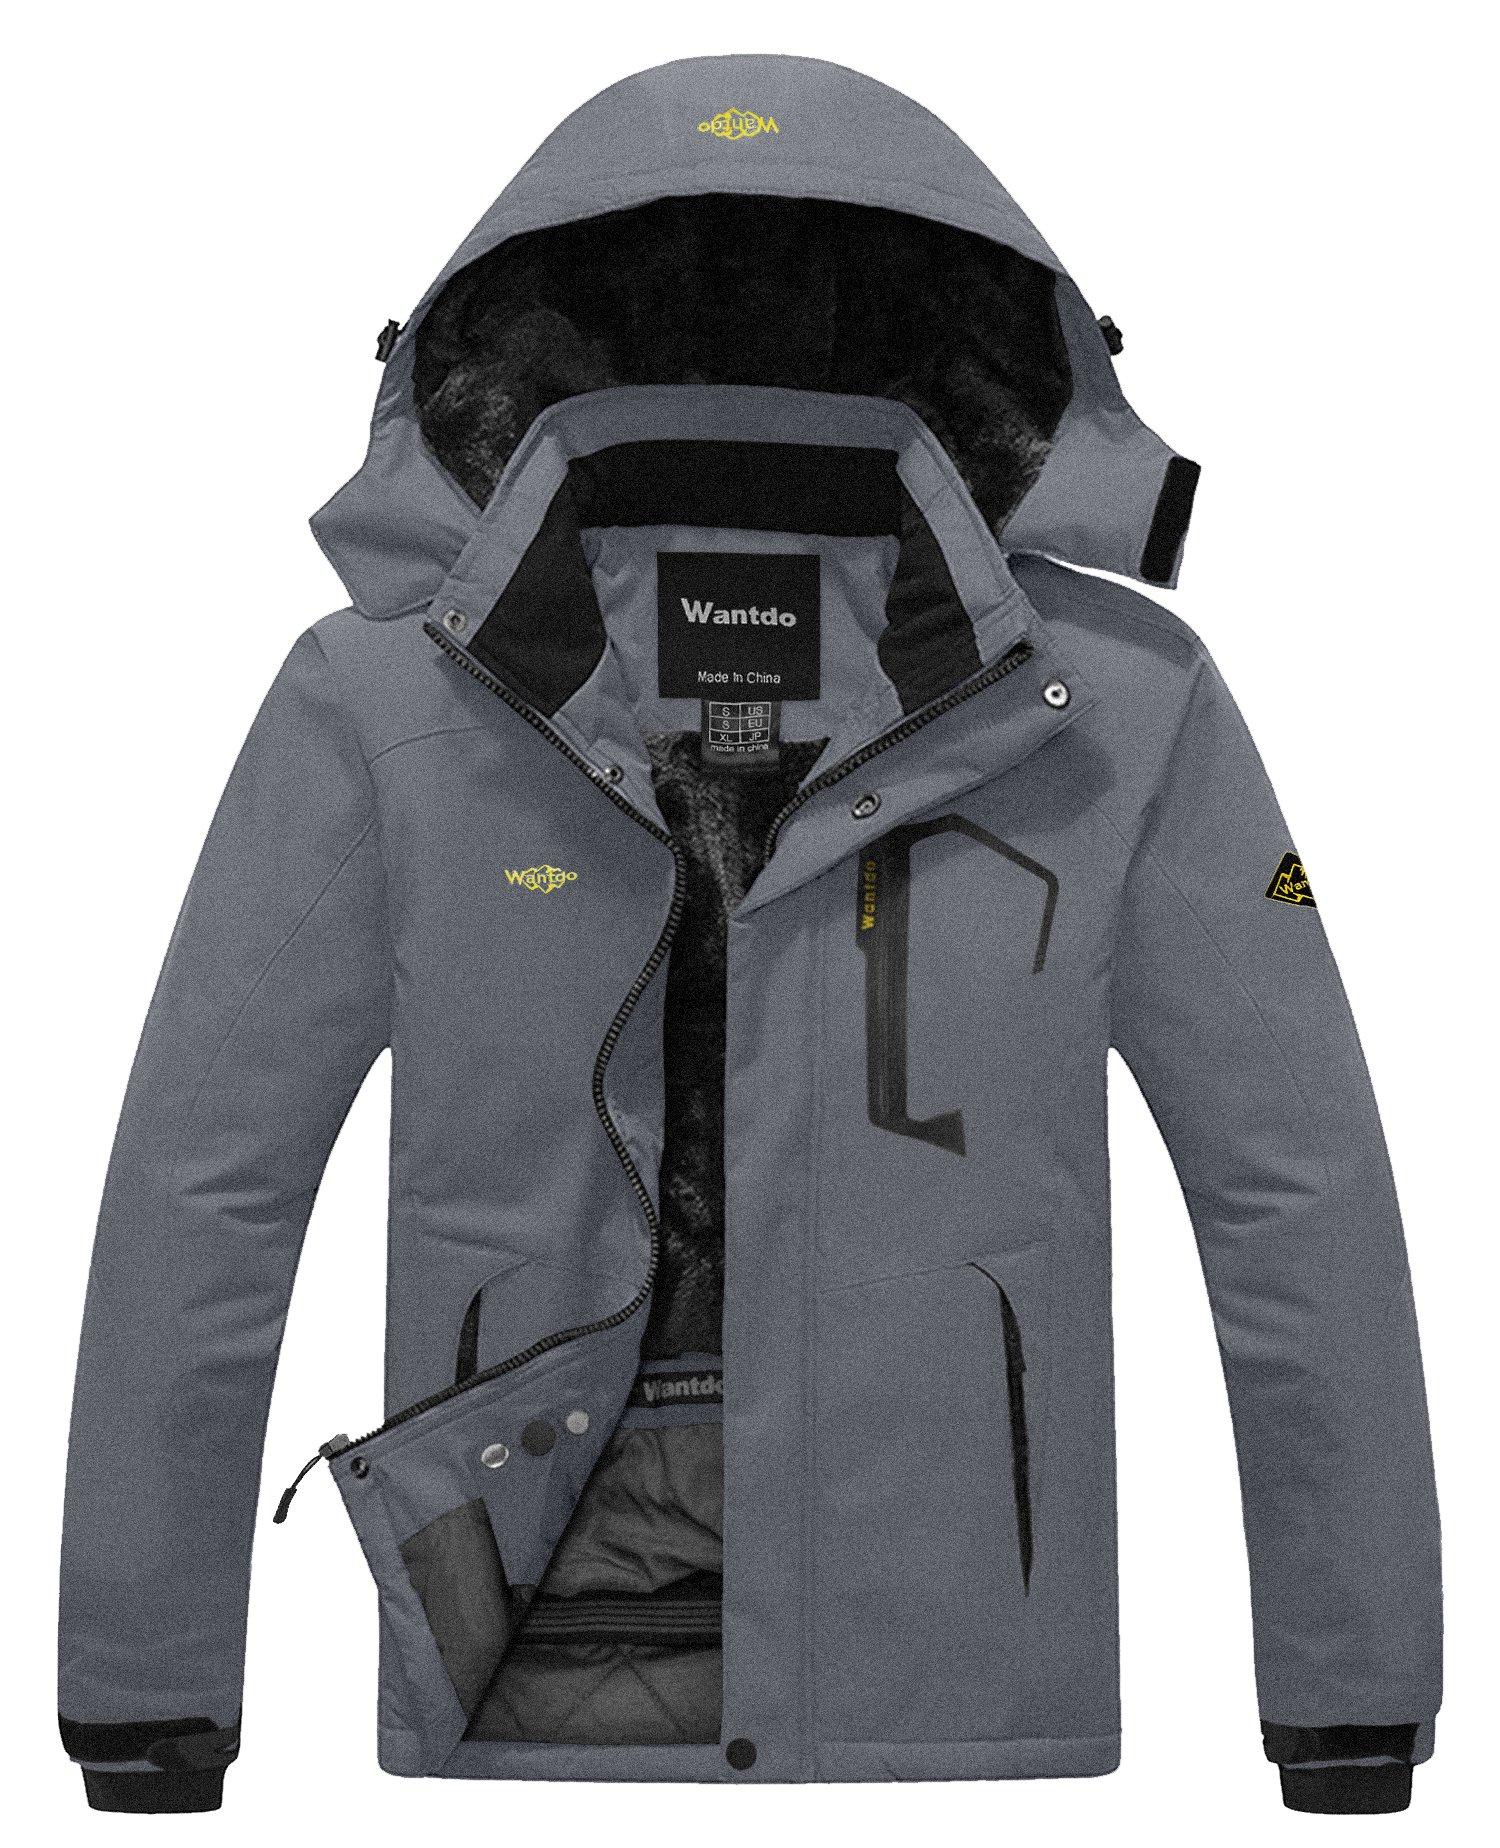 Wantdo Men's Waterproof Fleece Ski Jacket Windproof Rain Jacket Snowboarding Jacket Dark Grey S